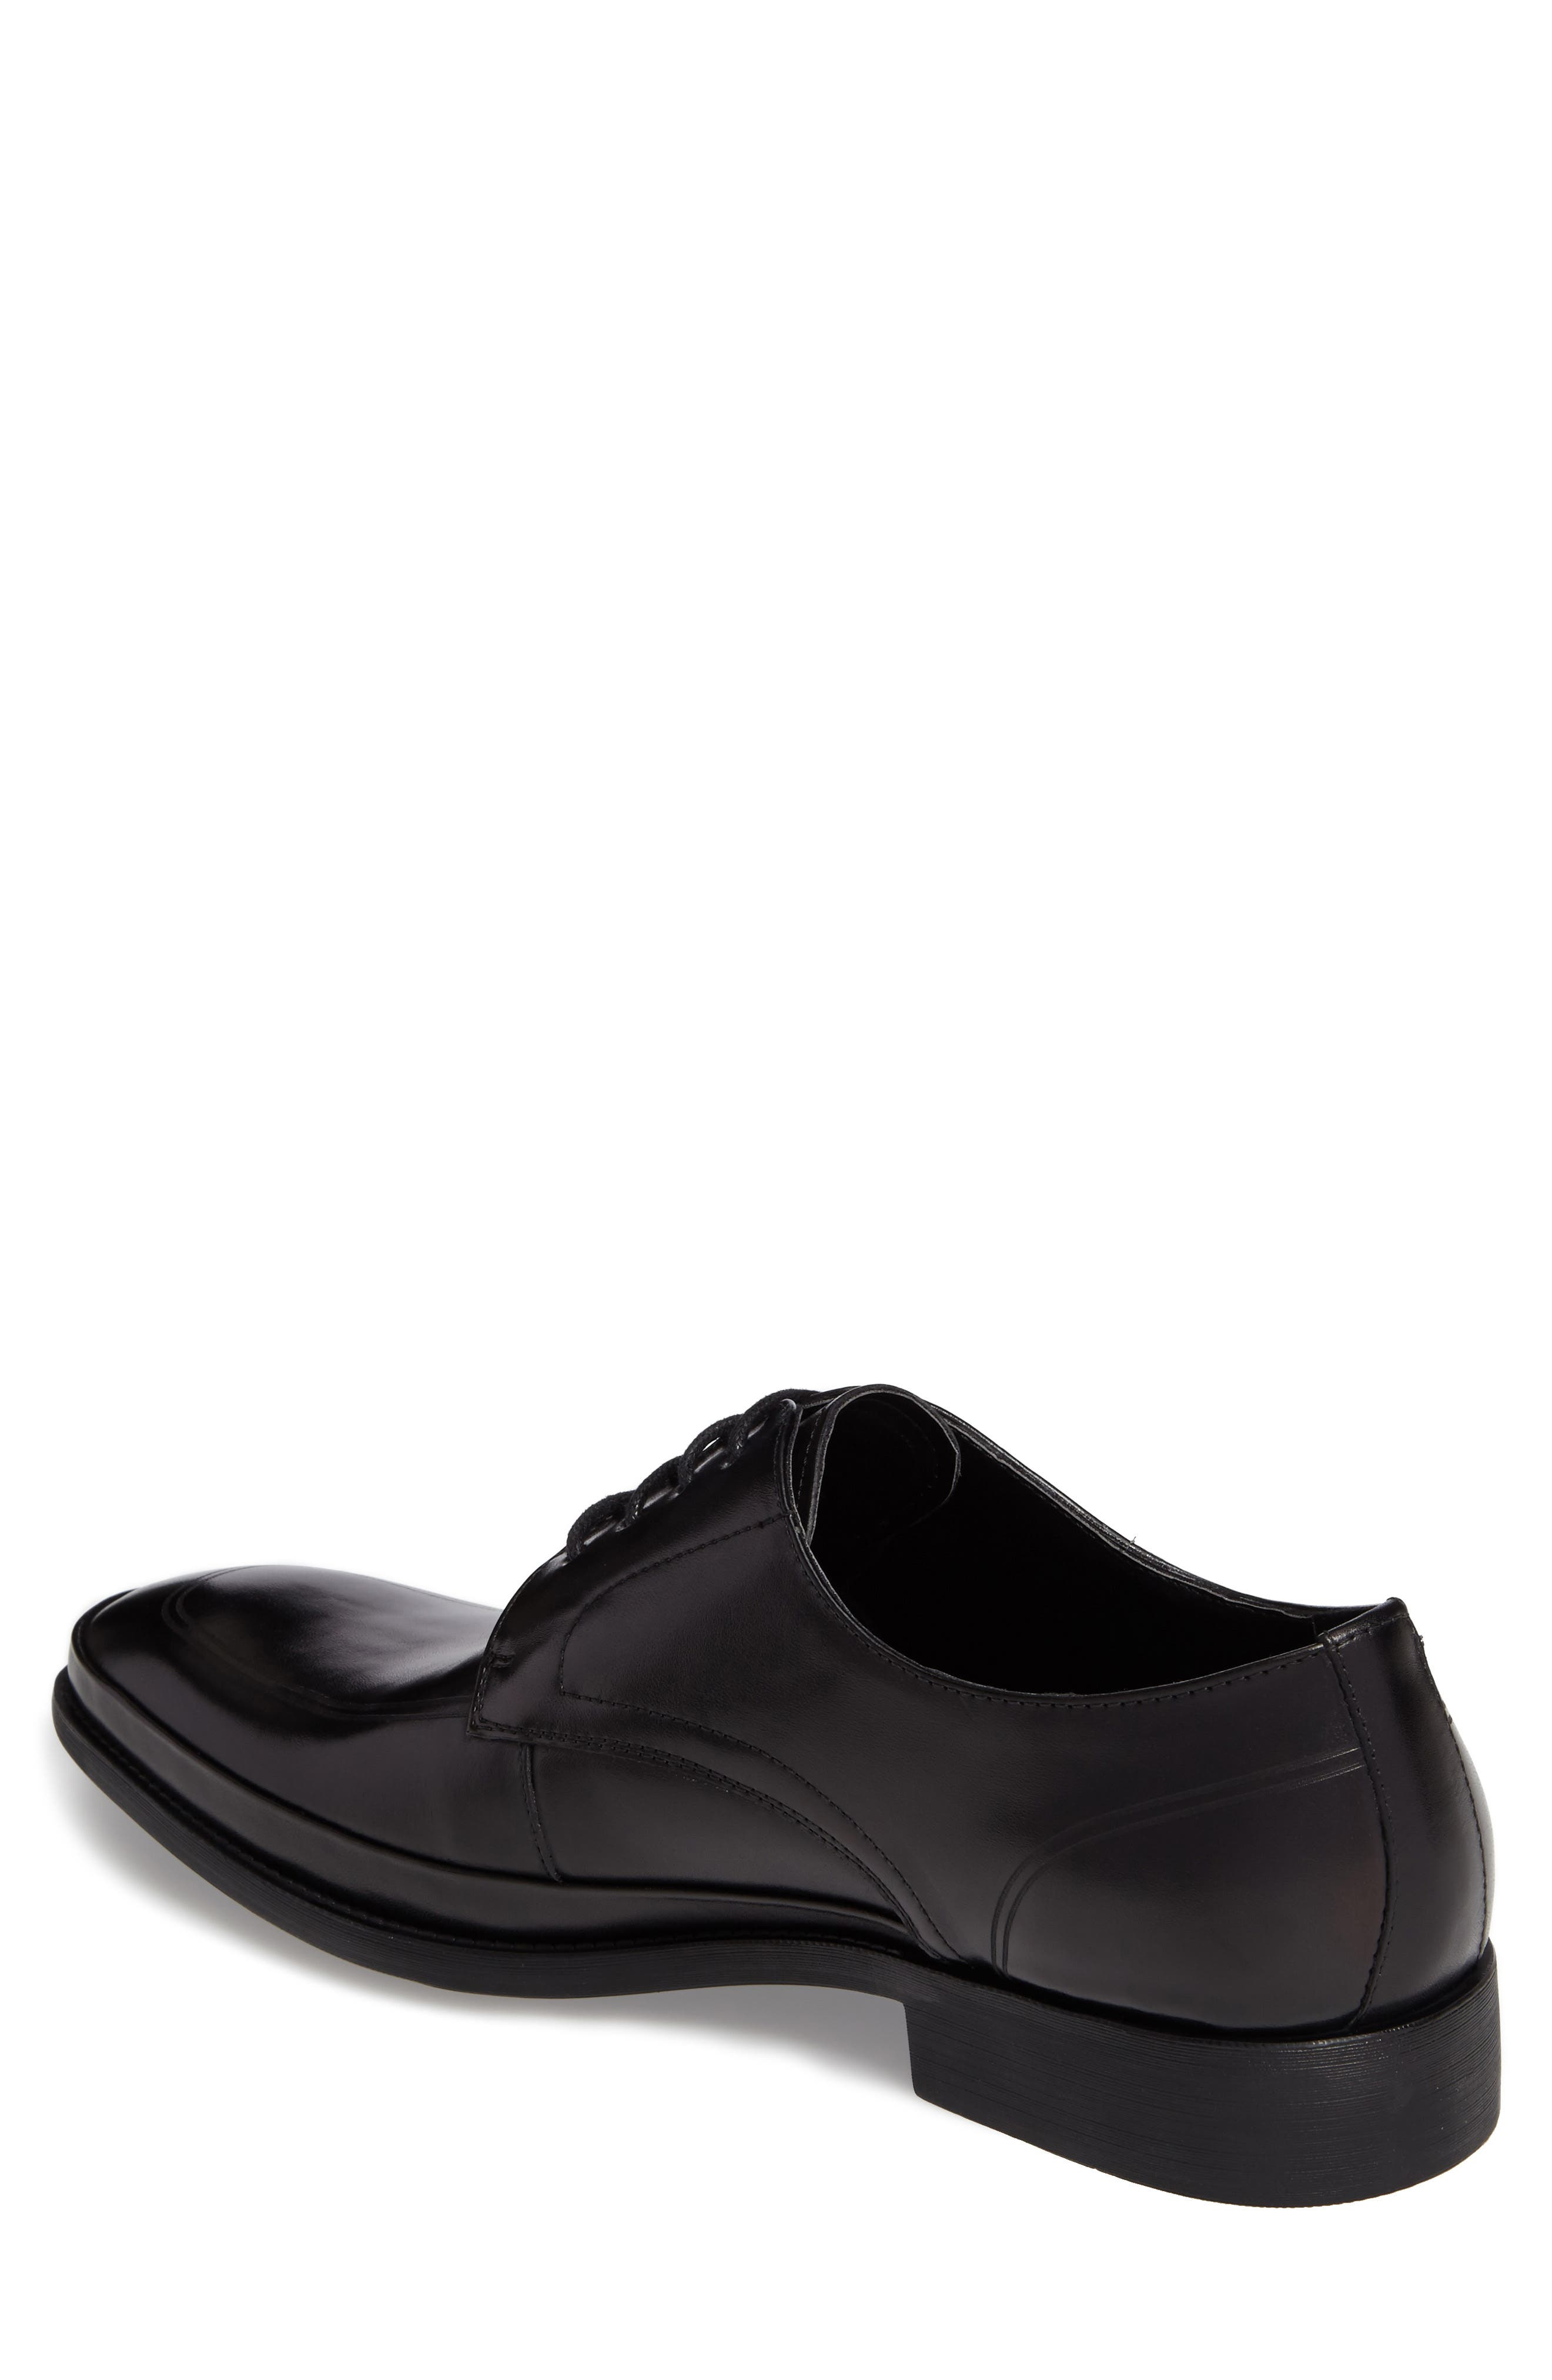 Brick Free Plain Toe Derby,                             Alternate thumbnail 2, color,                             Black Leather